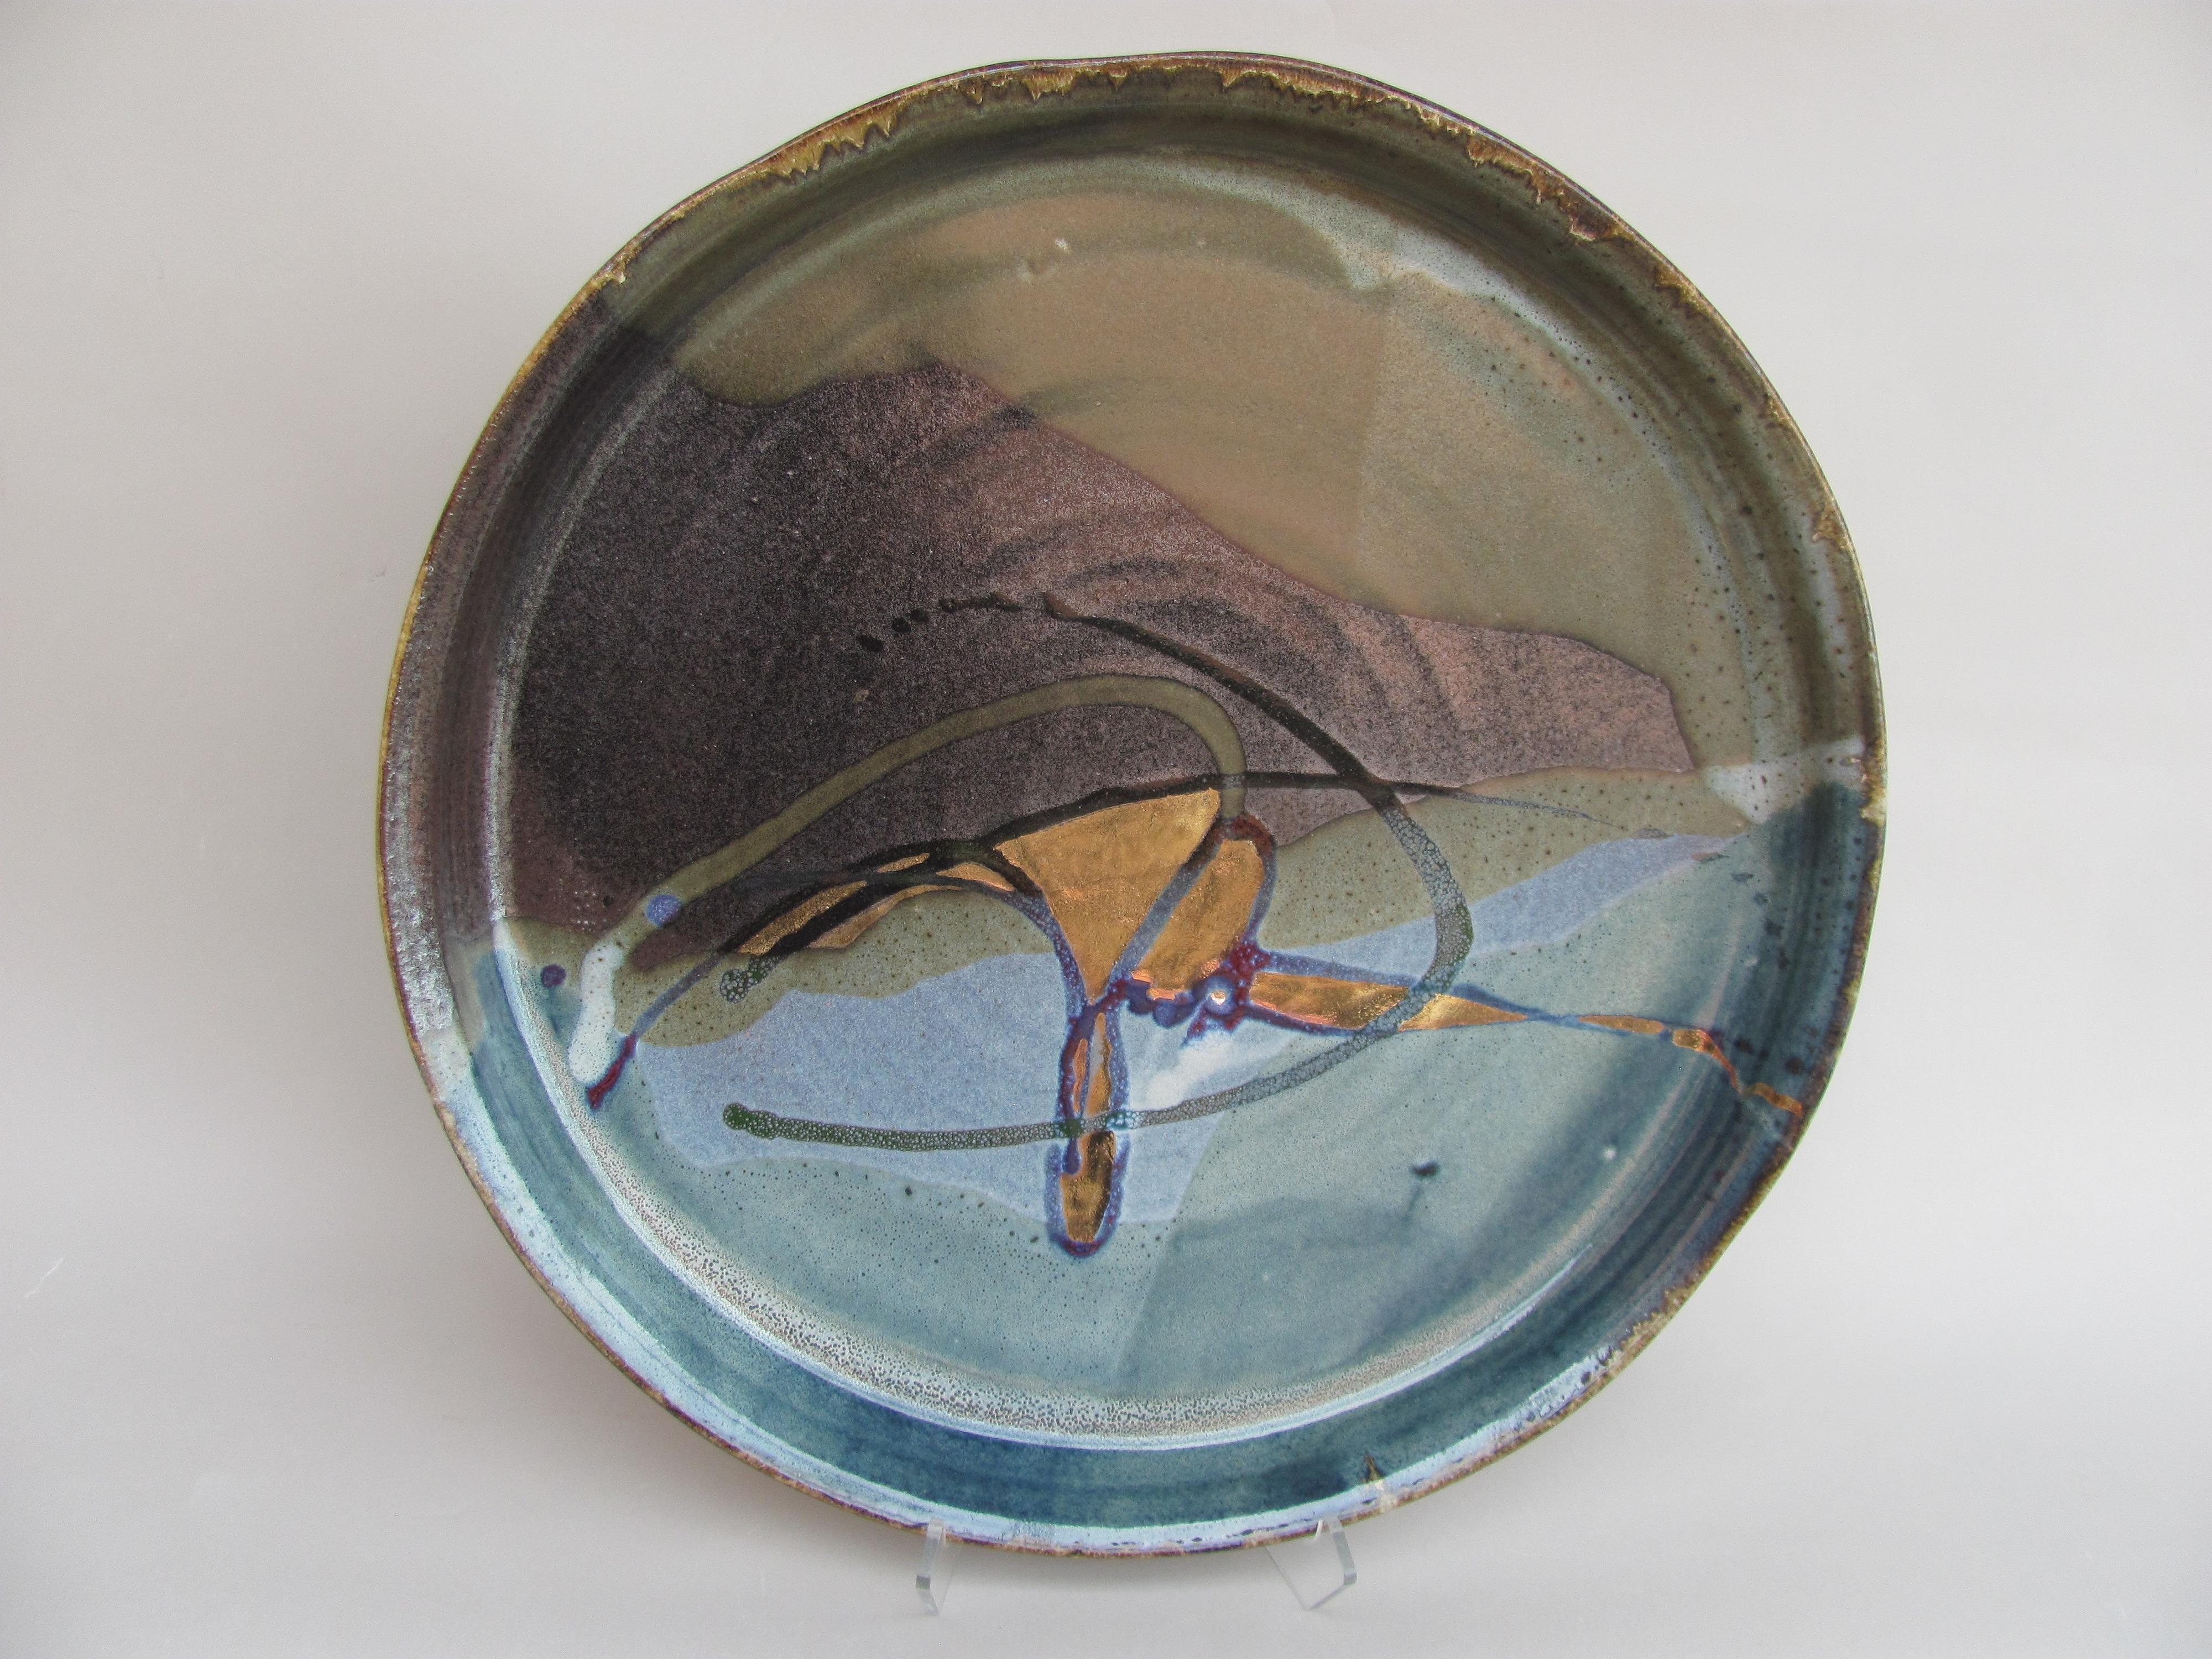 luster platter 5 by Macy Dorf | ArtworkNetwork.com